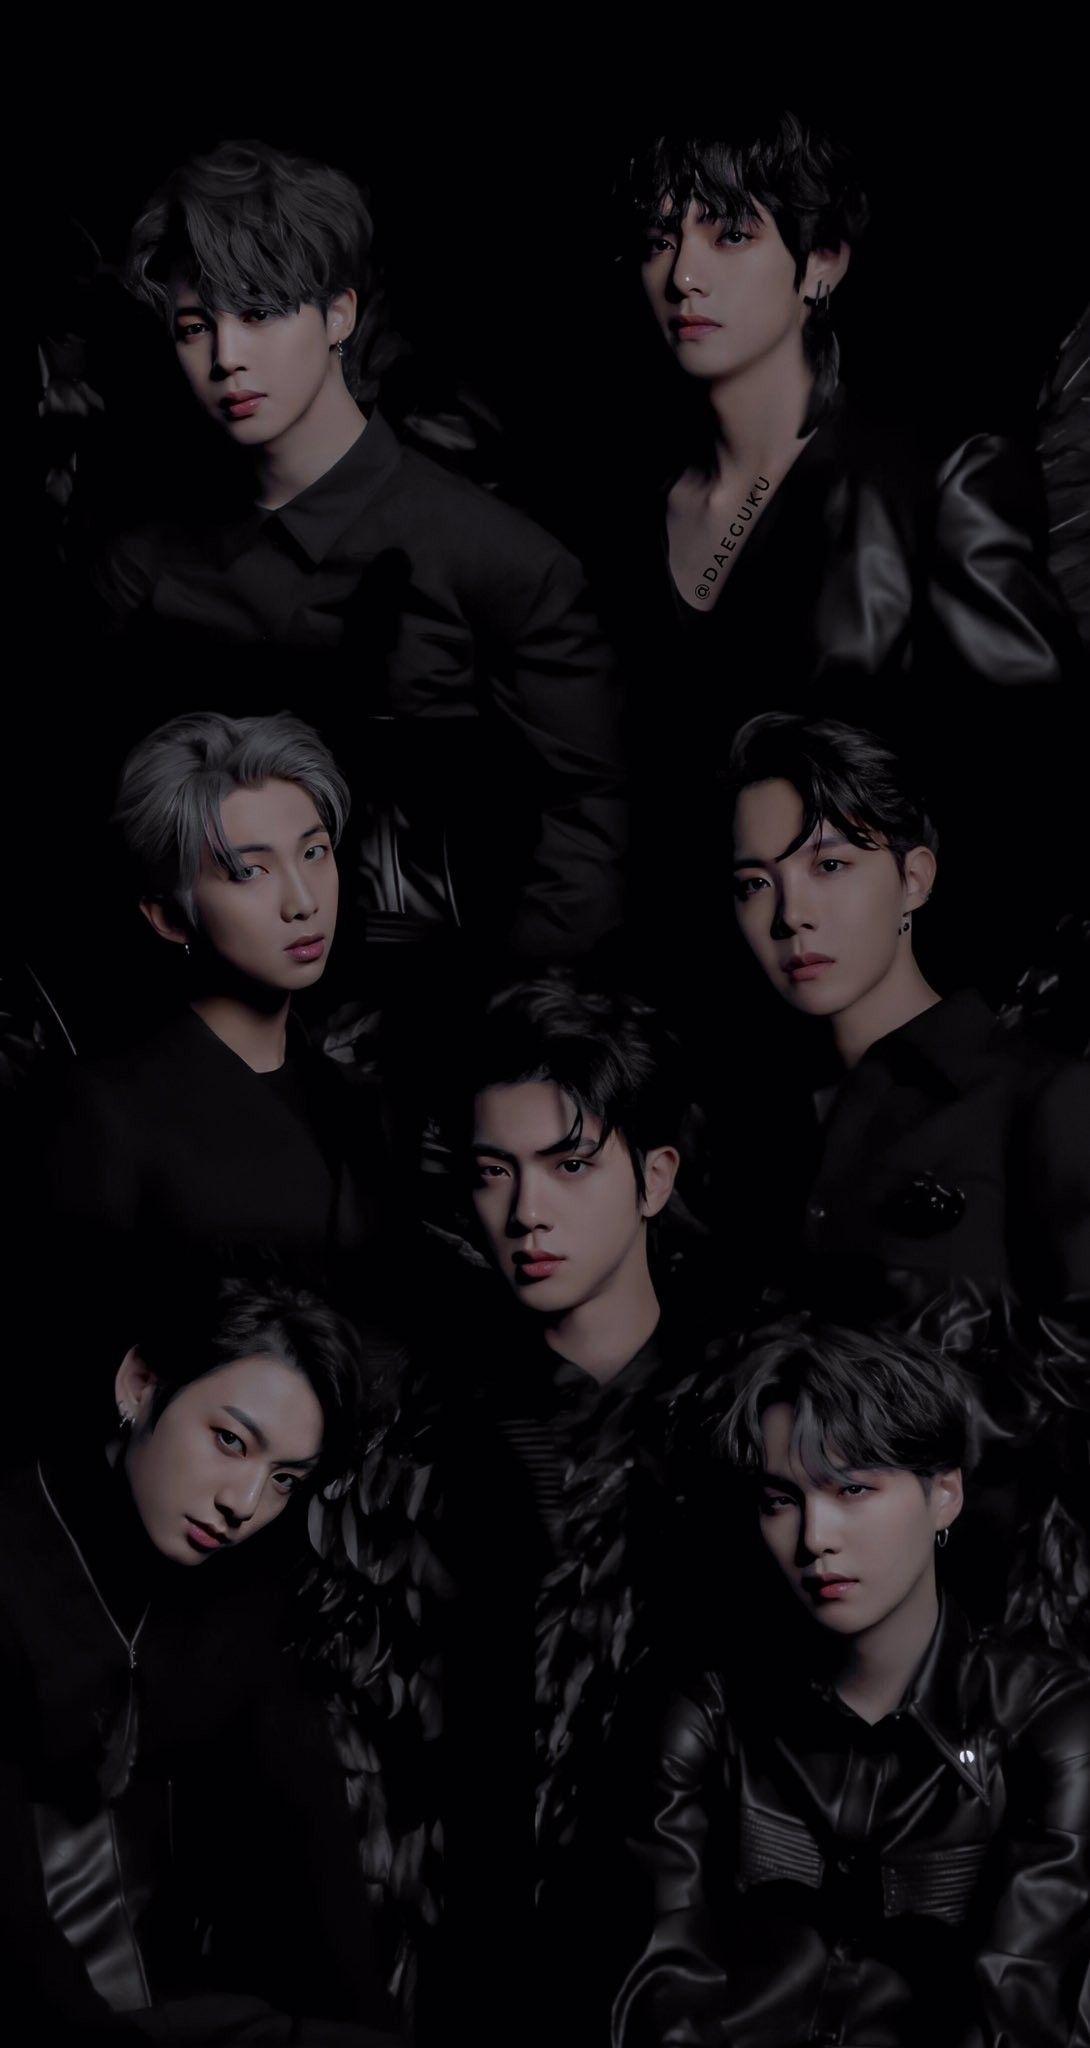 BTS 방탄소년단 MAP_OF_THE_SOUL_7 Concept Photo version 2 di